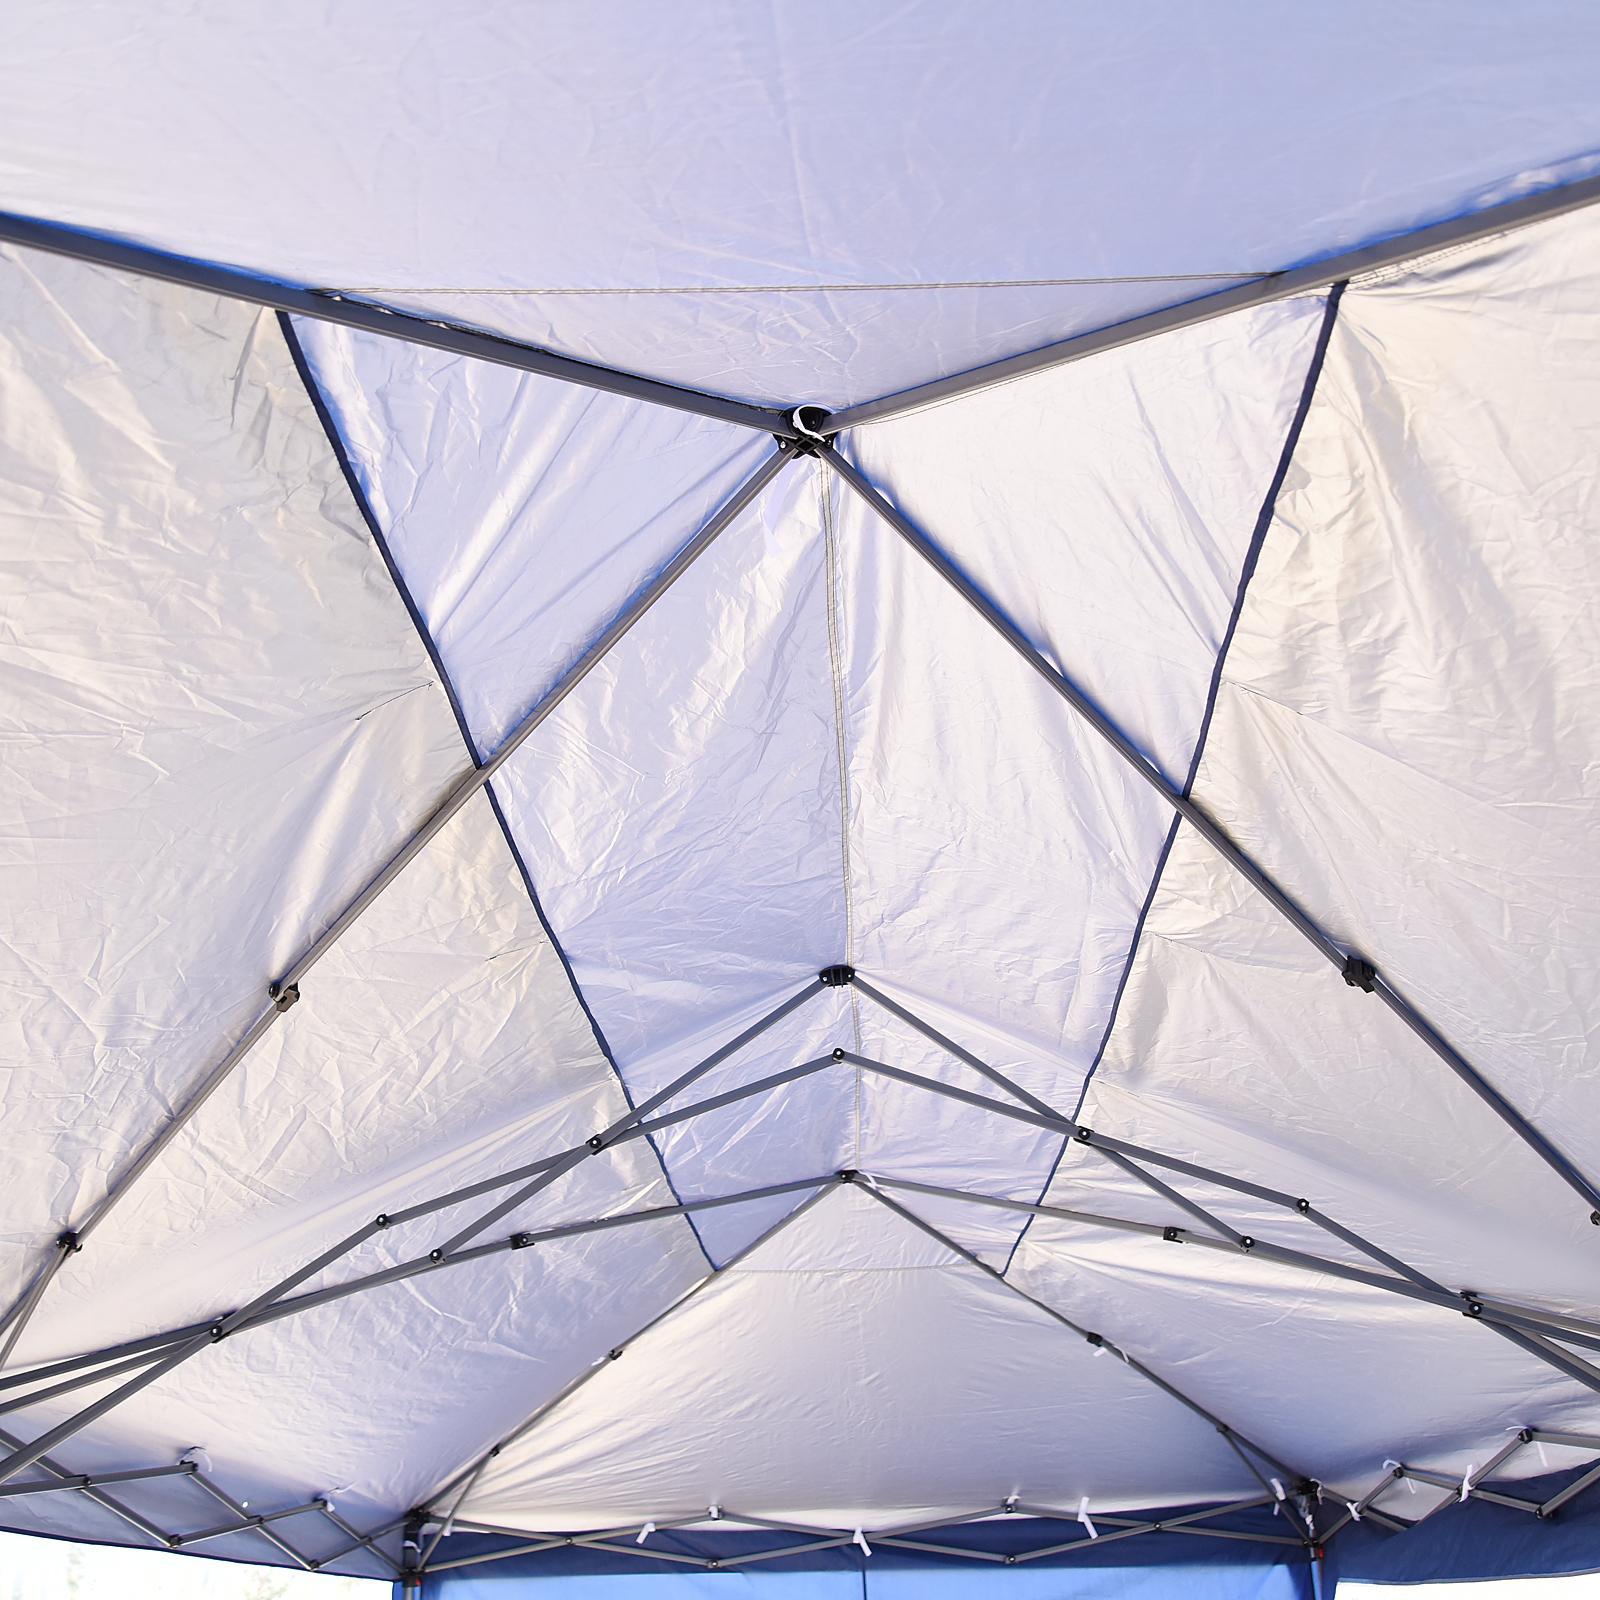 Outdoor-10-039-x20-039-EZ-POP-UP-Gazebo-Wedding-Party-Tent-Canopy-Folding-w-Carry-Bag thumbnail 11